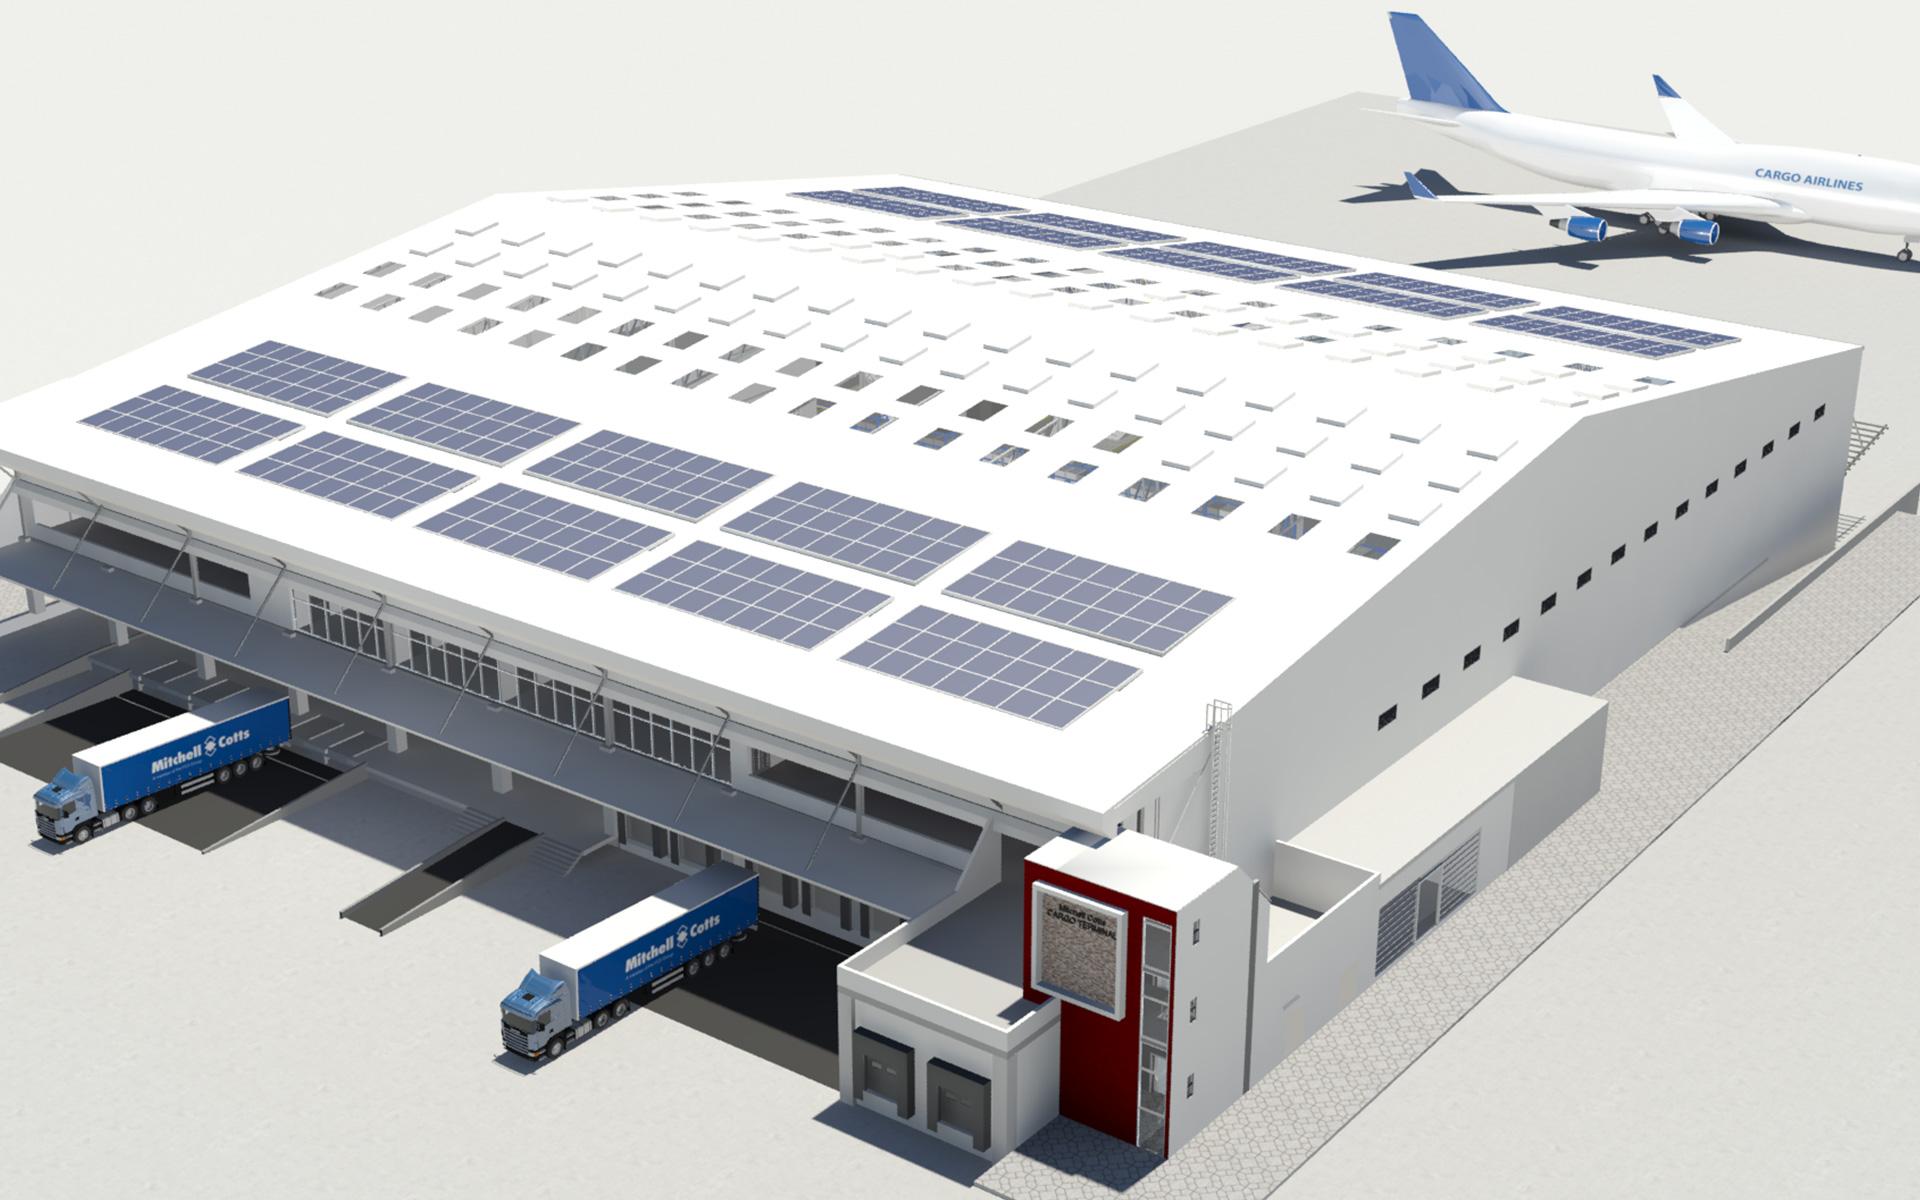 Mitchell Cotts Cargo Terminal Kenya